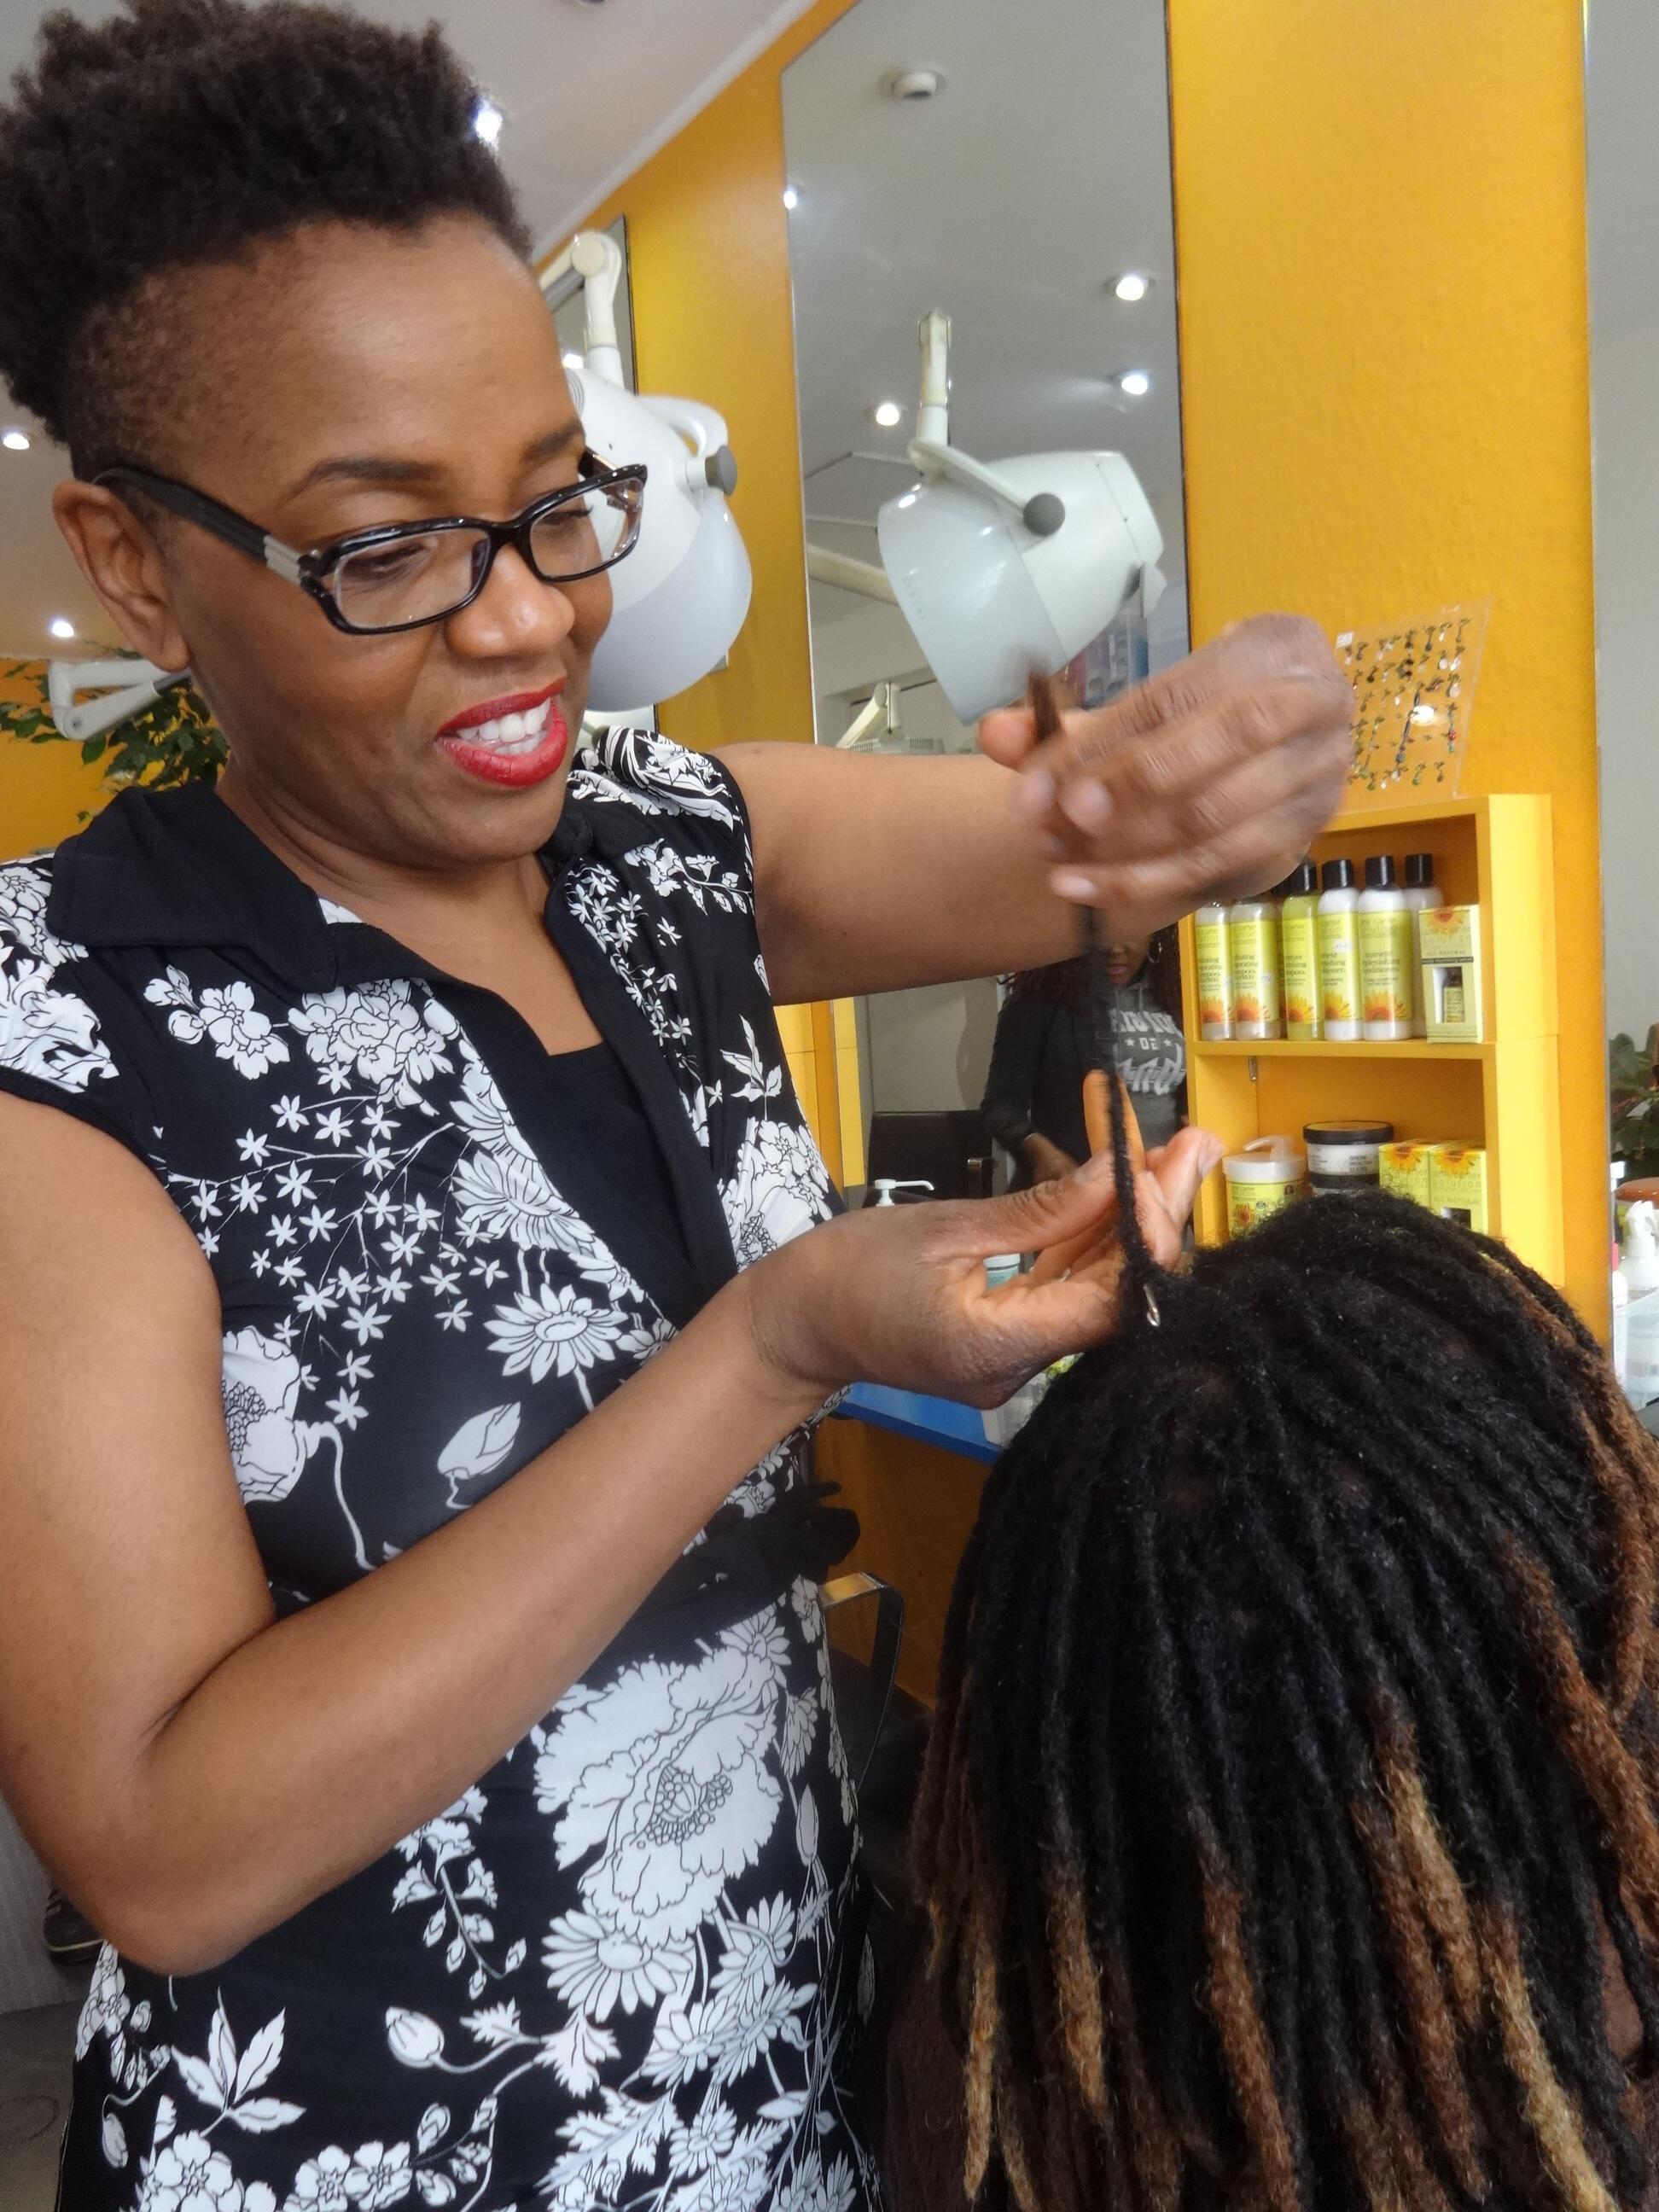 Aline Tacite works on a client's dreadlocks in her hair salon, Boucles d'ébène.